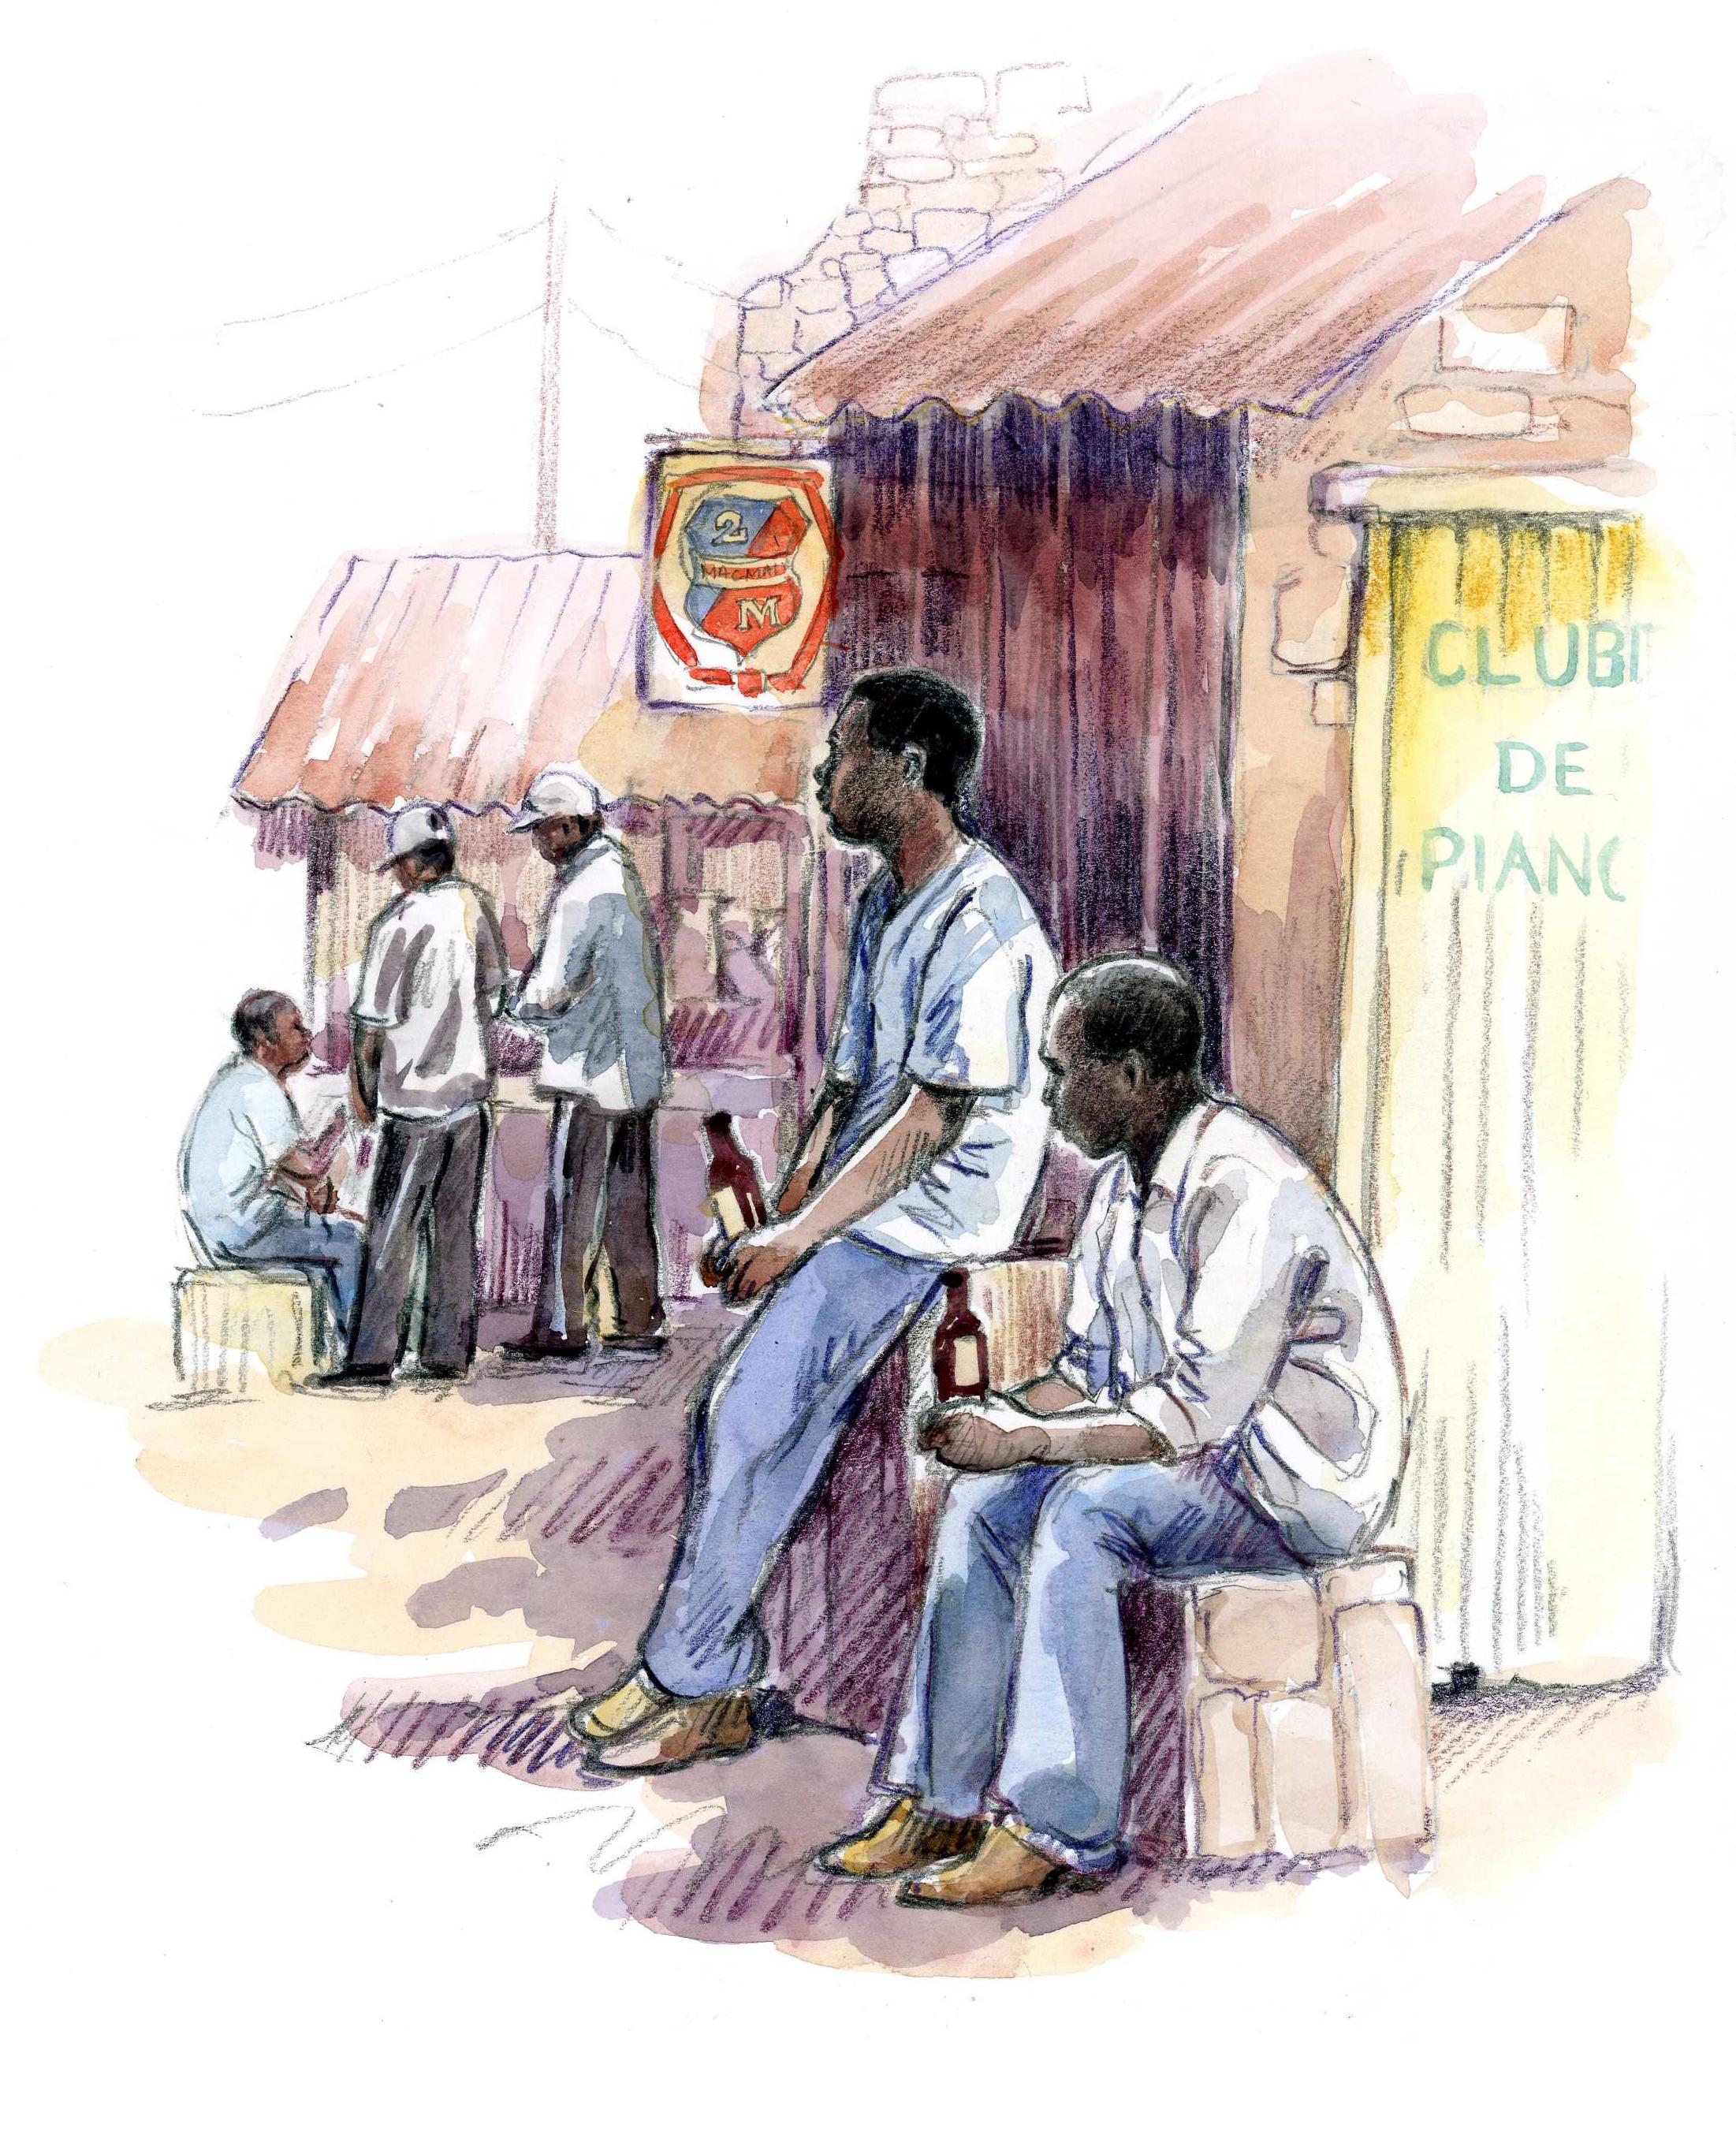 'Street Children' by Anthony Robinson